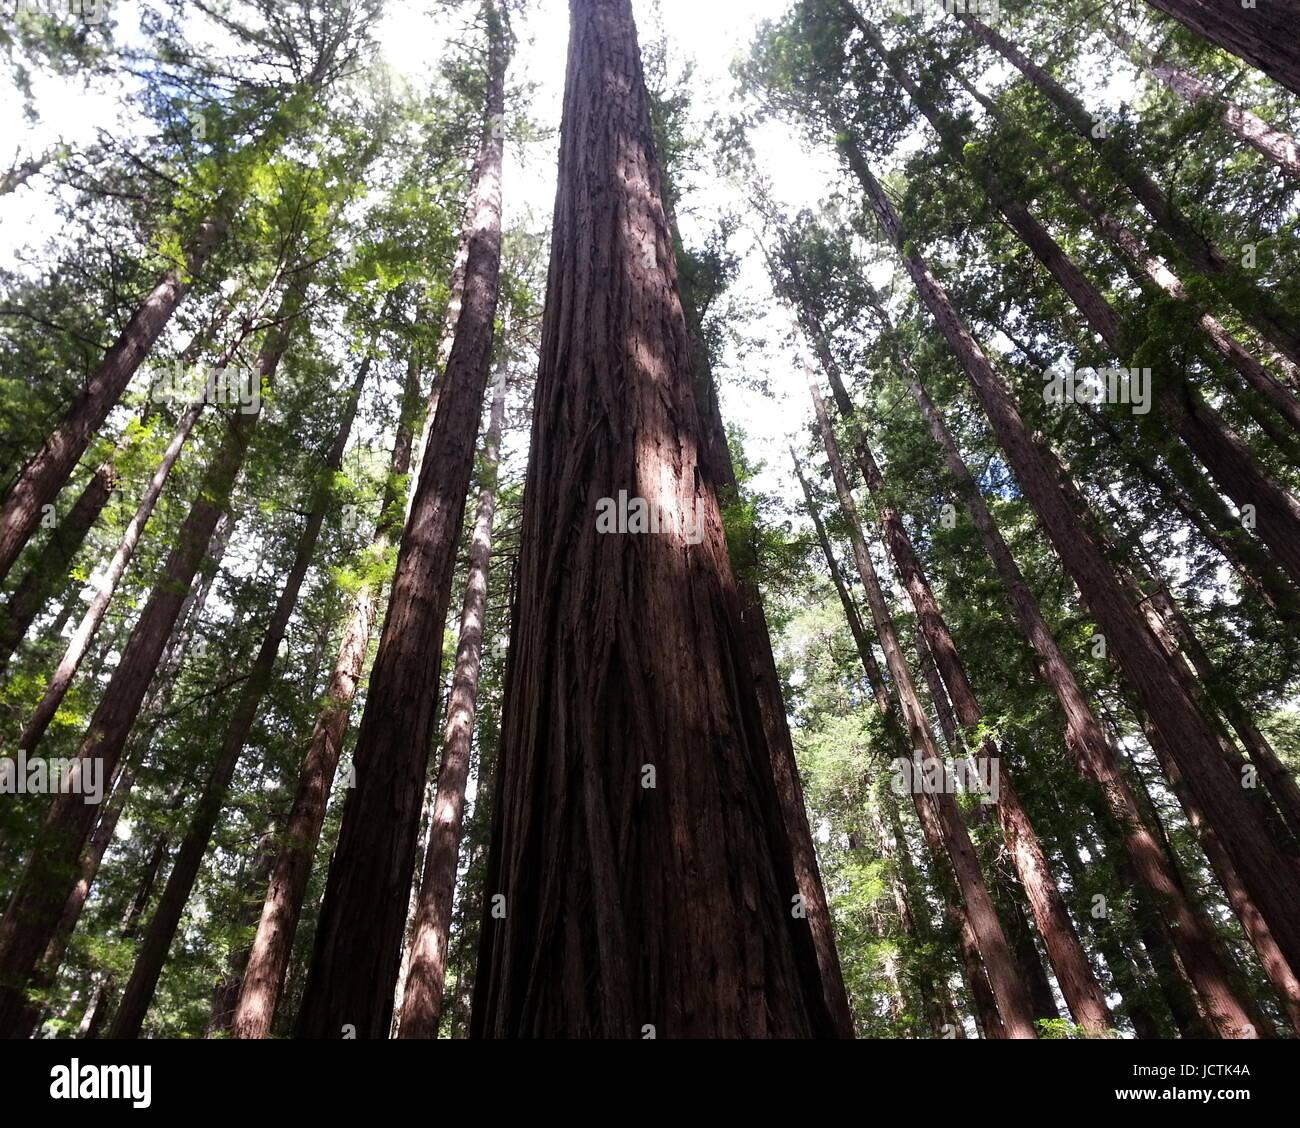 Towering Redwoods - Stock Image